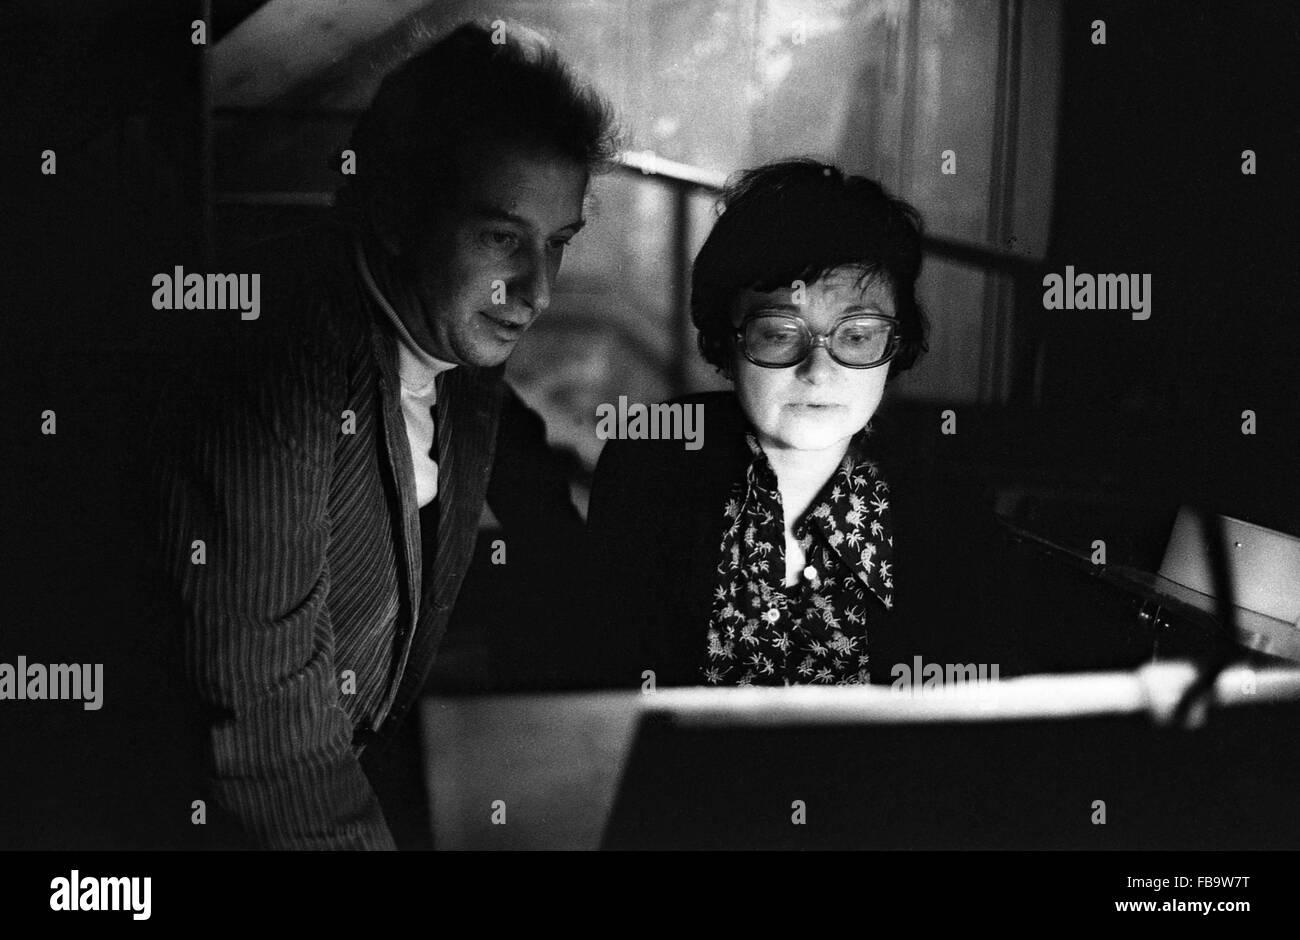 Dieter Schnebel, Paris, 1975 -  1975  -  France / Paris  -  Dieter Schnebel, Paris, 1975   -  Philippe Gras / Le - Stock Image